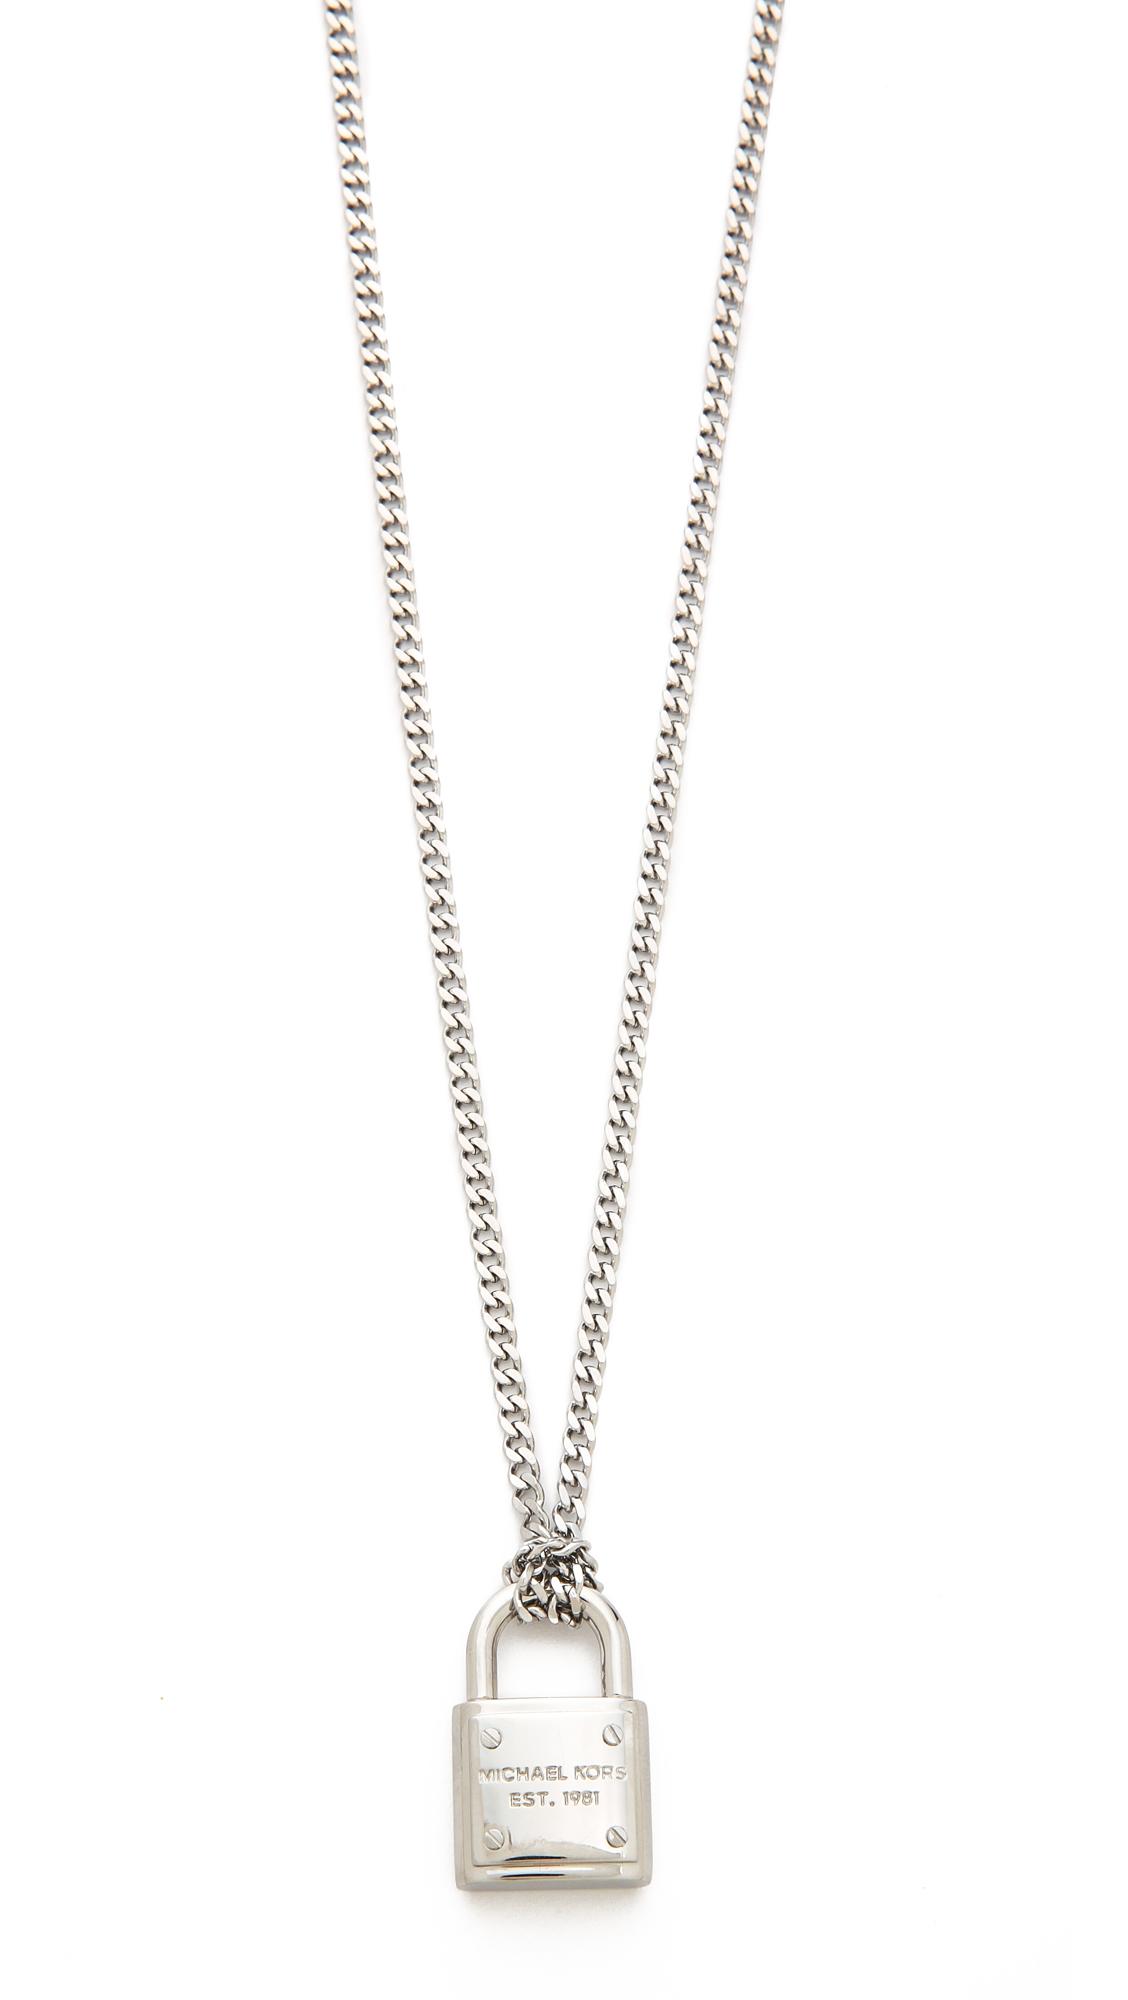 38bb0c5194ed1 Michael Kors Padlock Charm Necklace